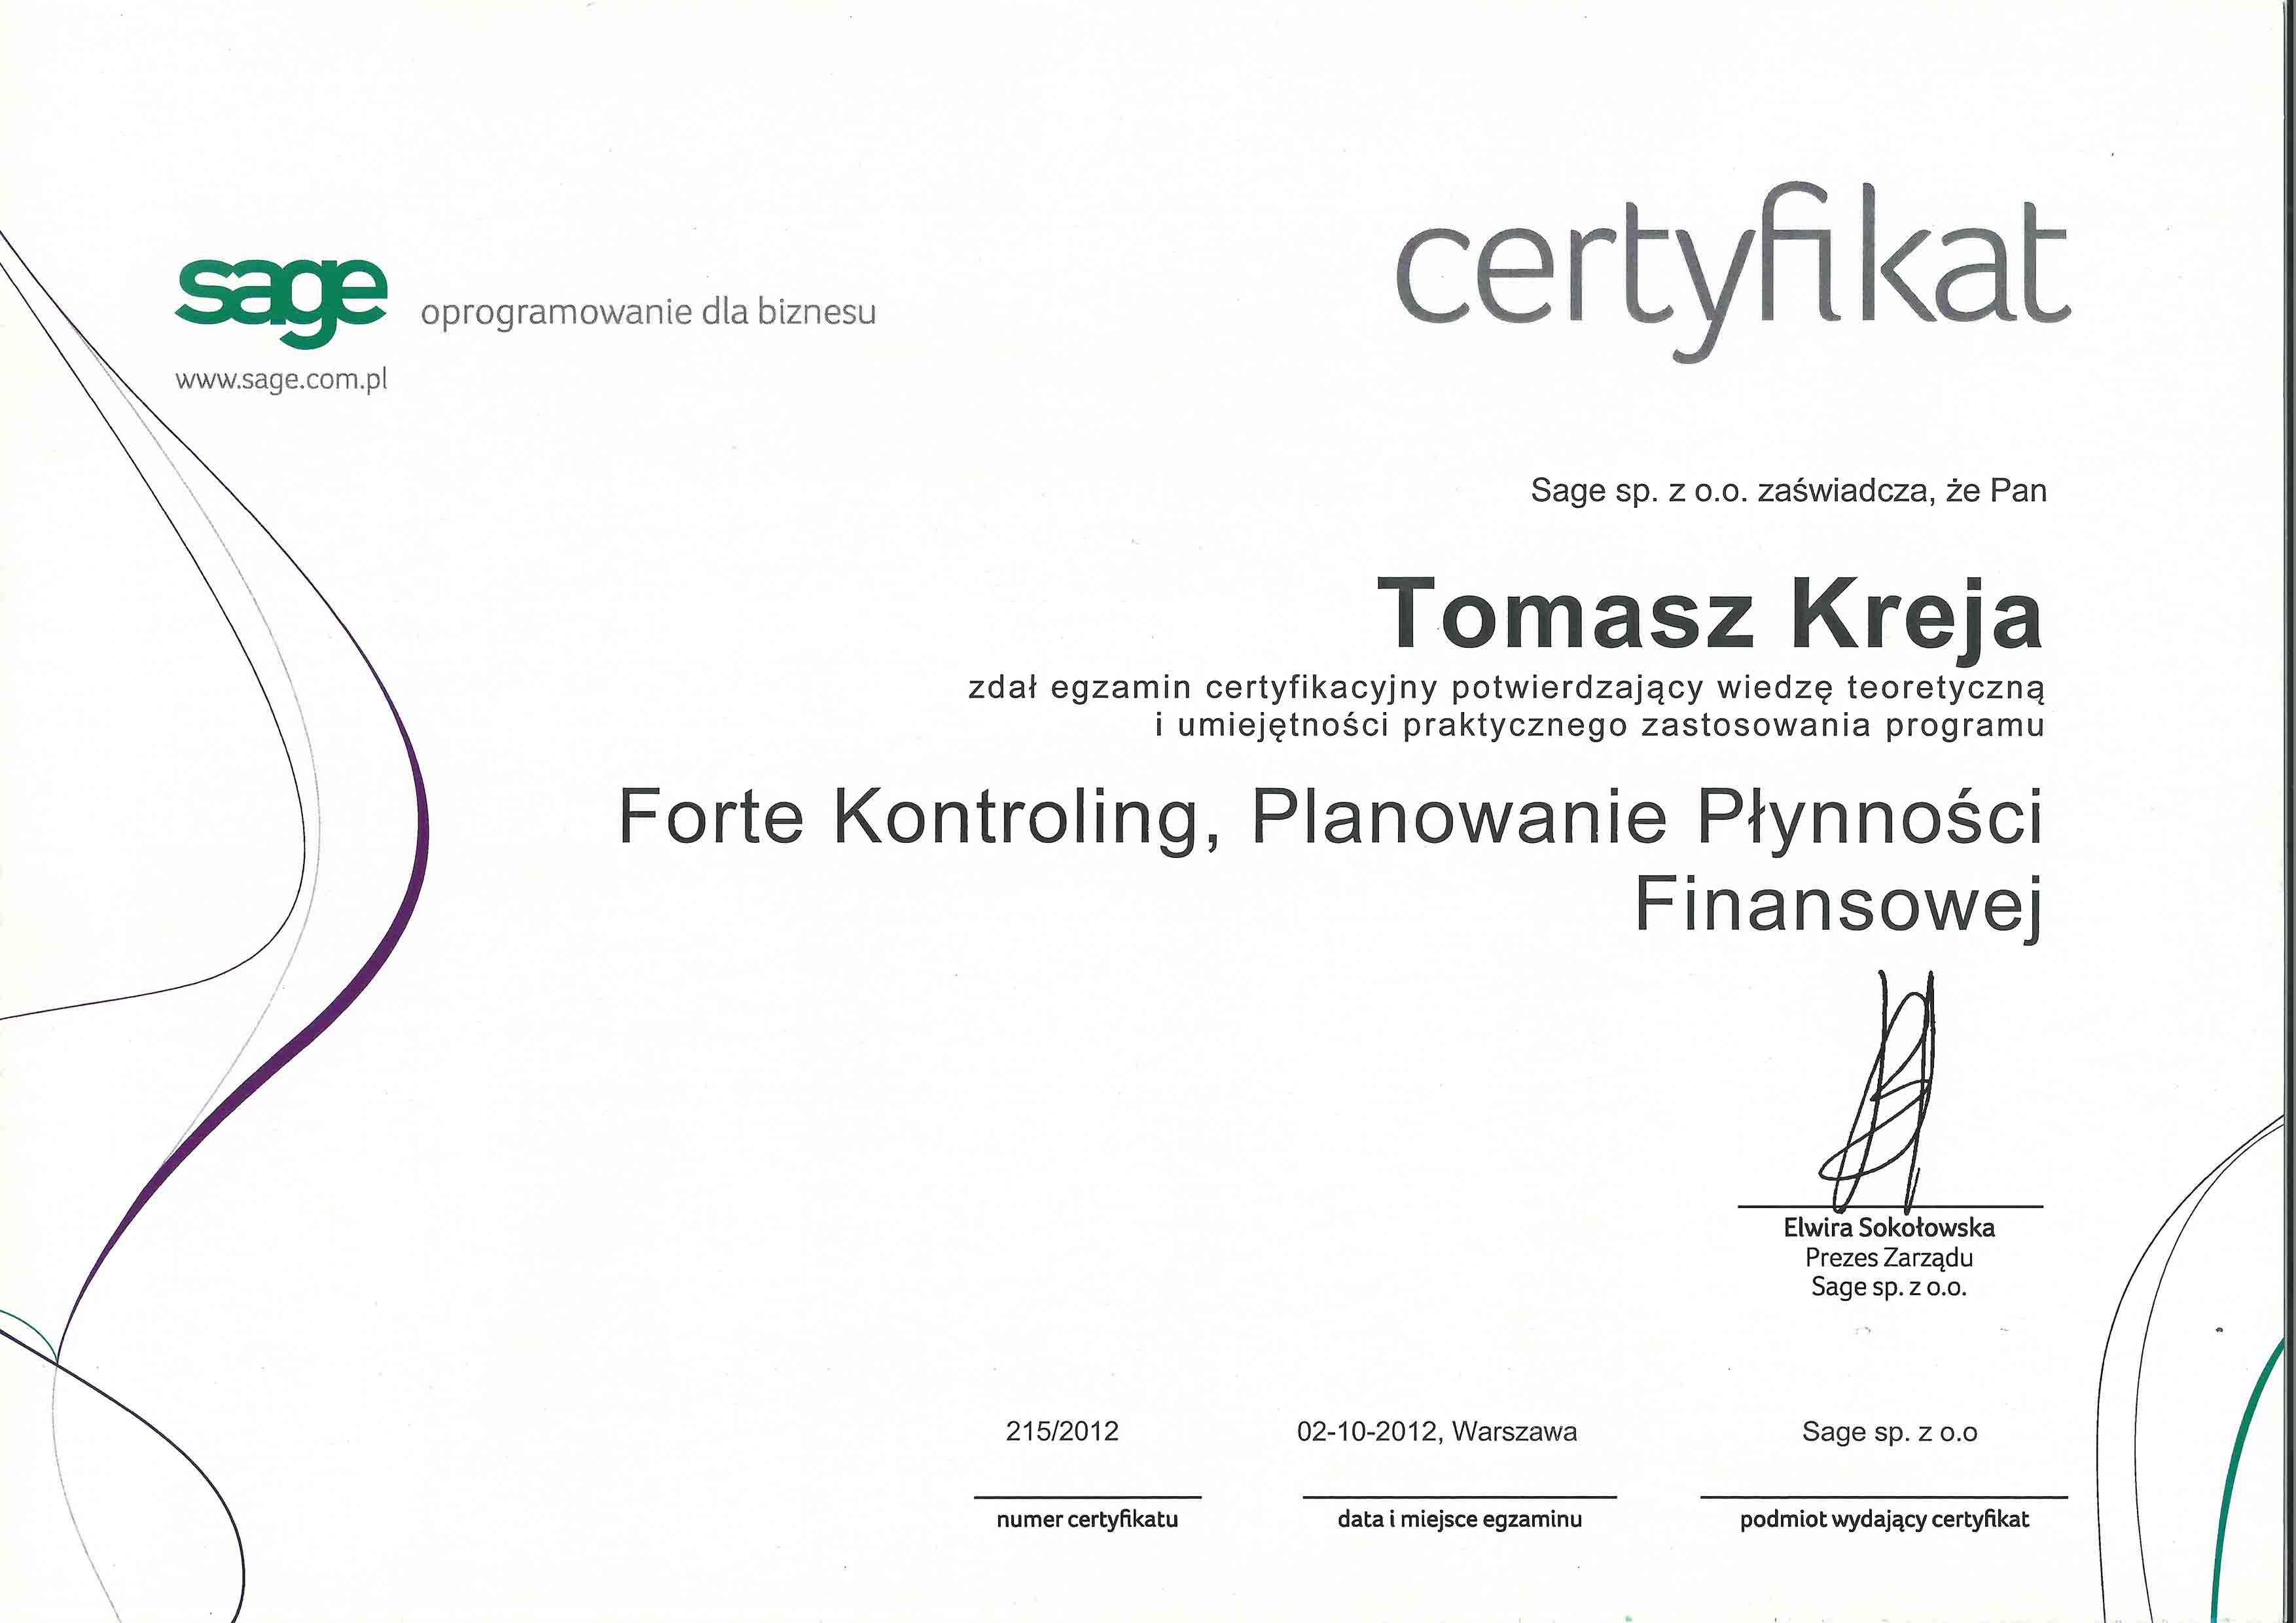 Certfikat_FORTE_PPF